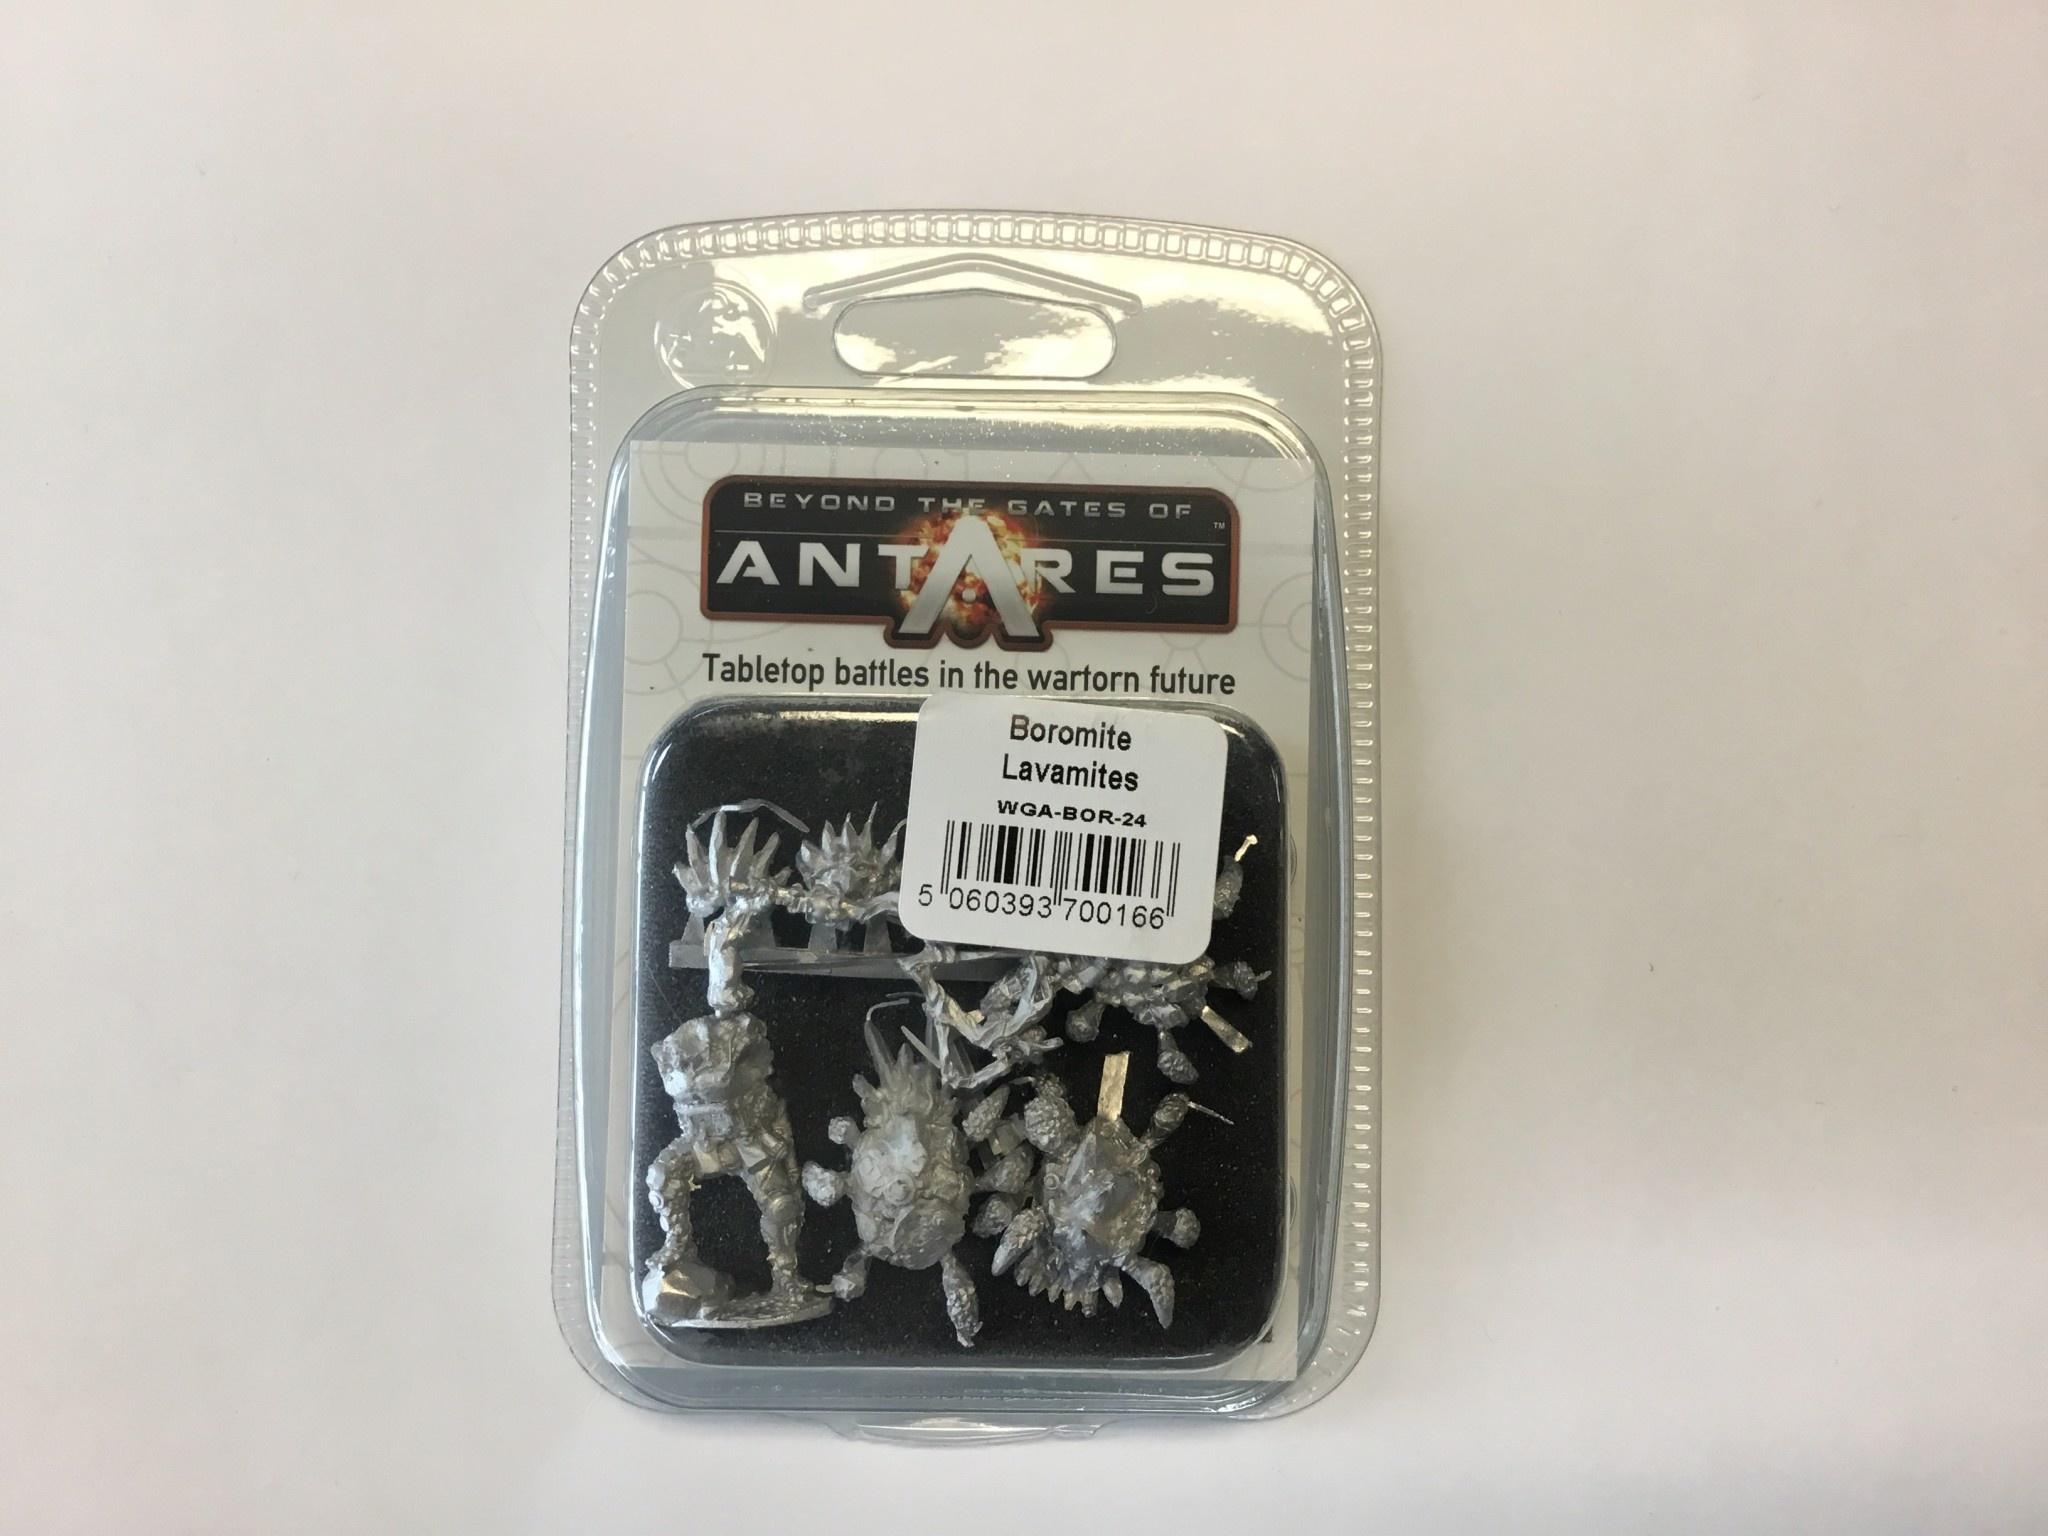 Warlord games Beyond the Gates of Antares: Boromite Lavamites